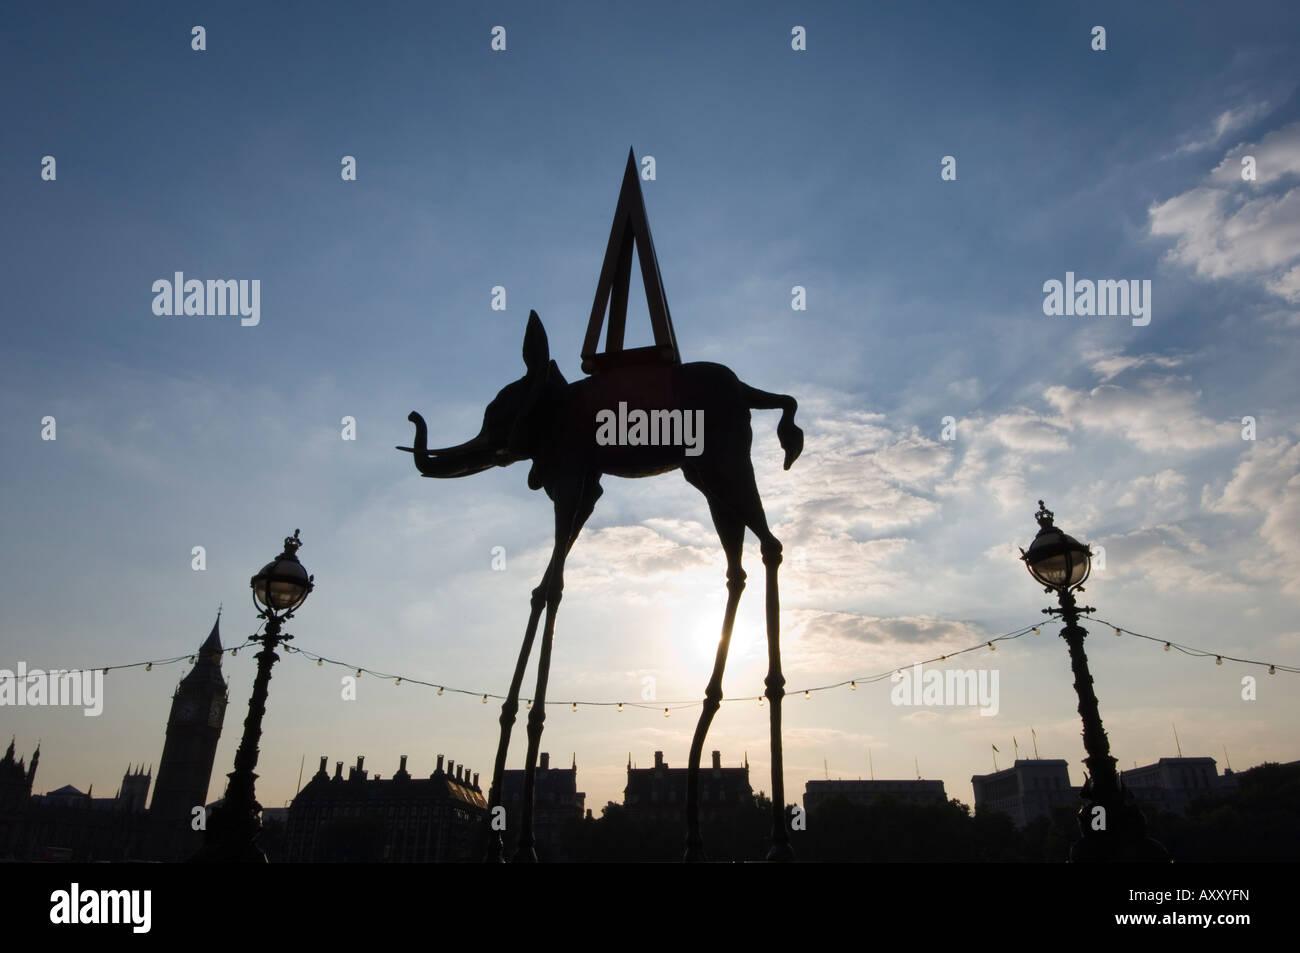 Dali elephant sculpture silhouette with Westminster skyline beyond, London, England, United Kingdom, Europe - Stock Image